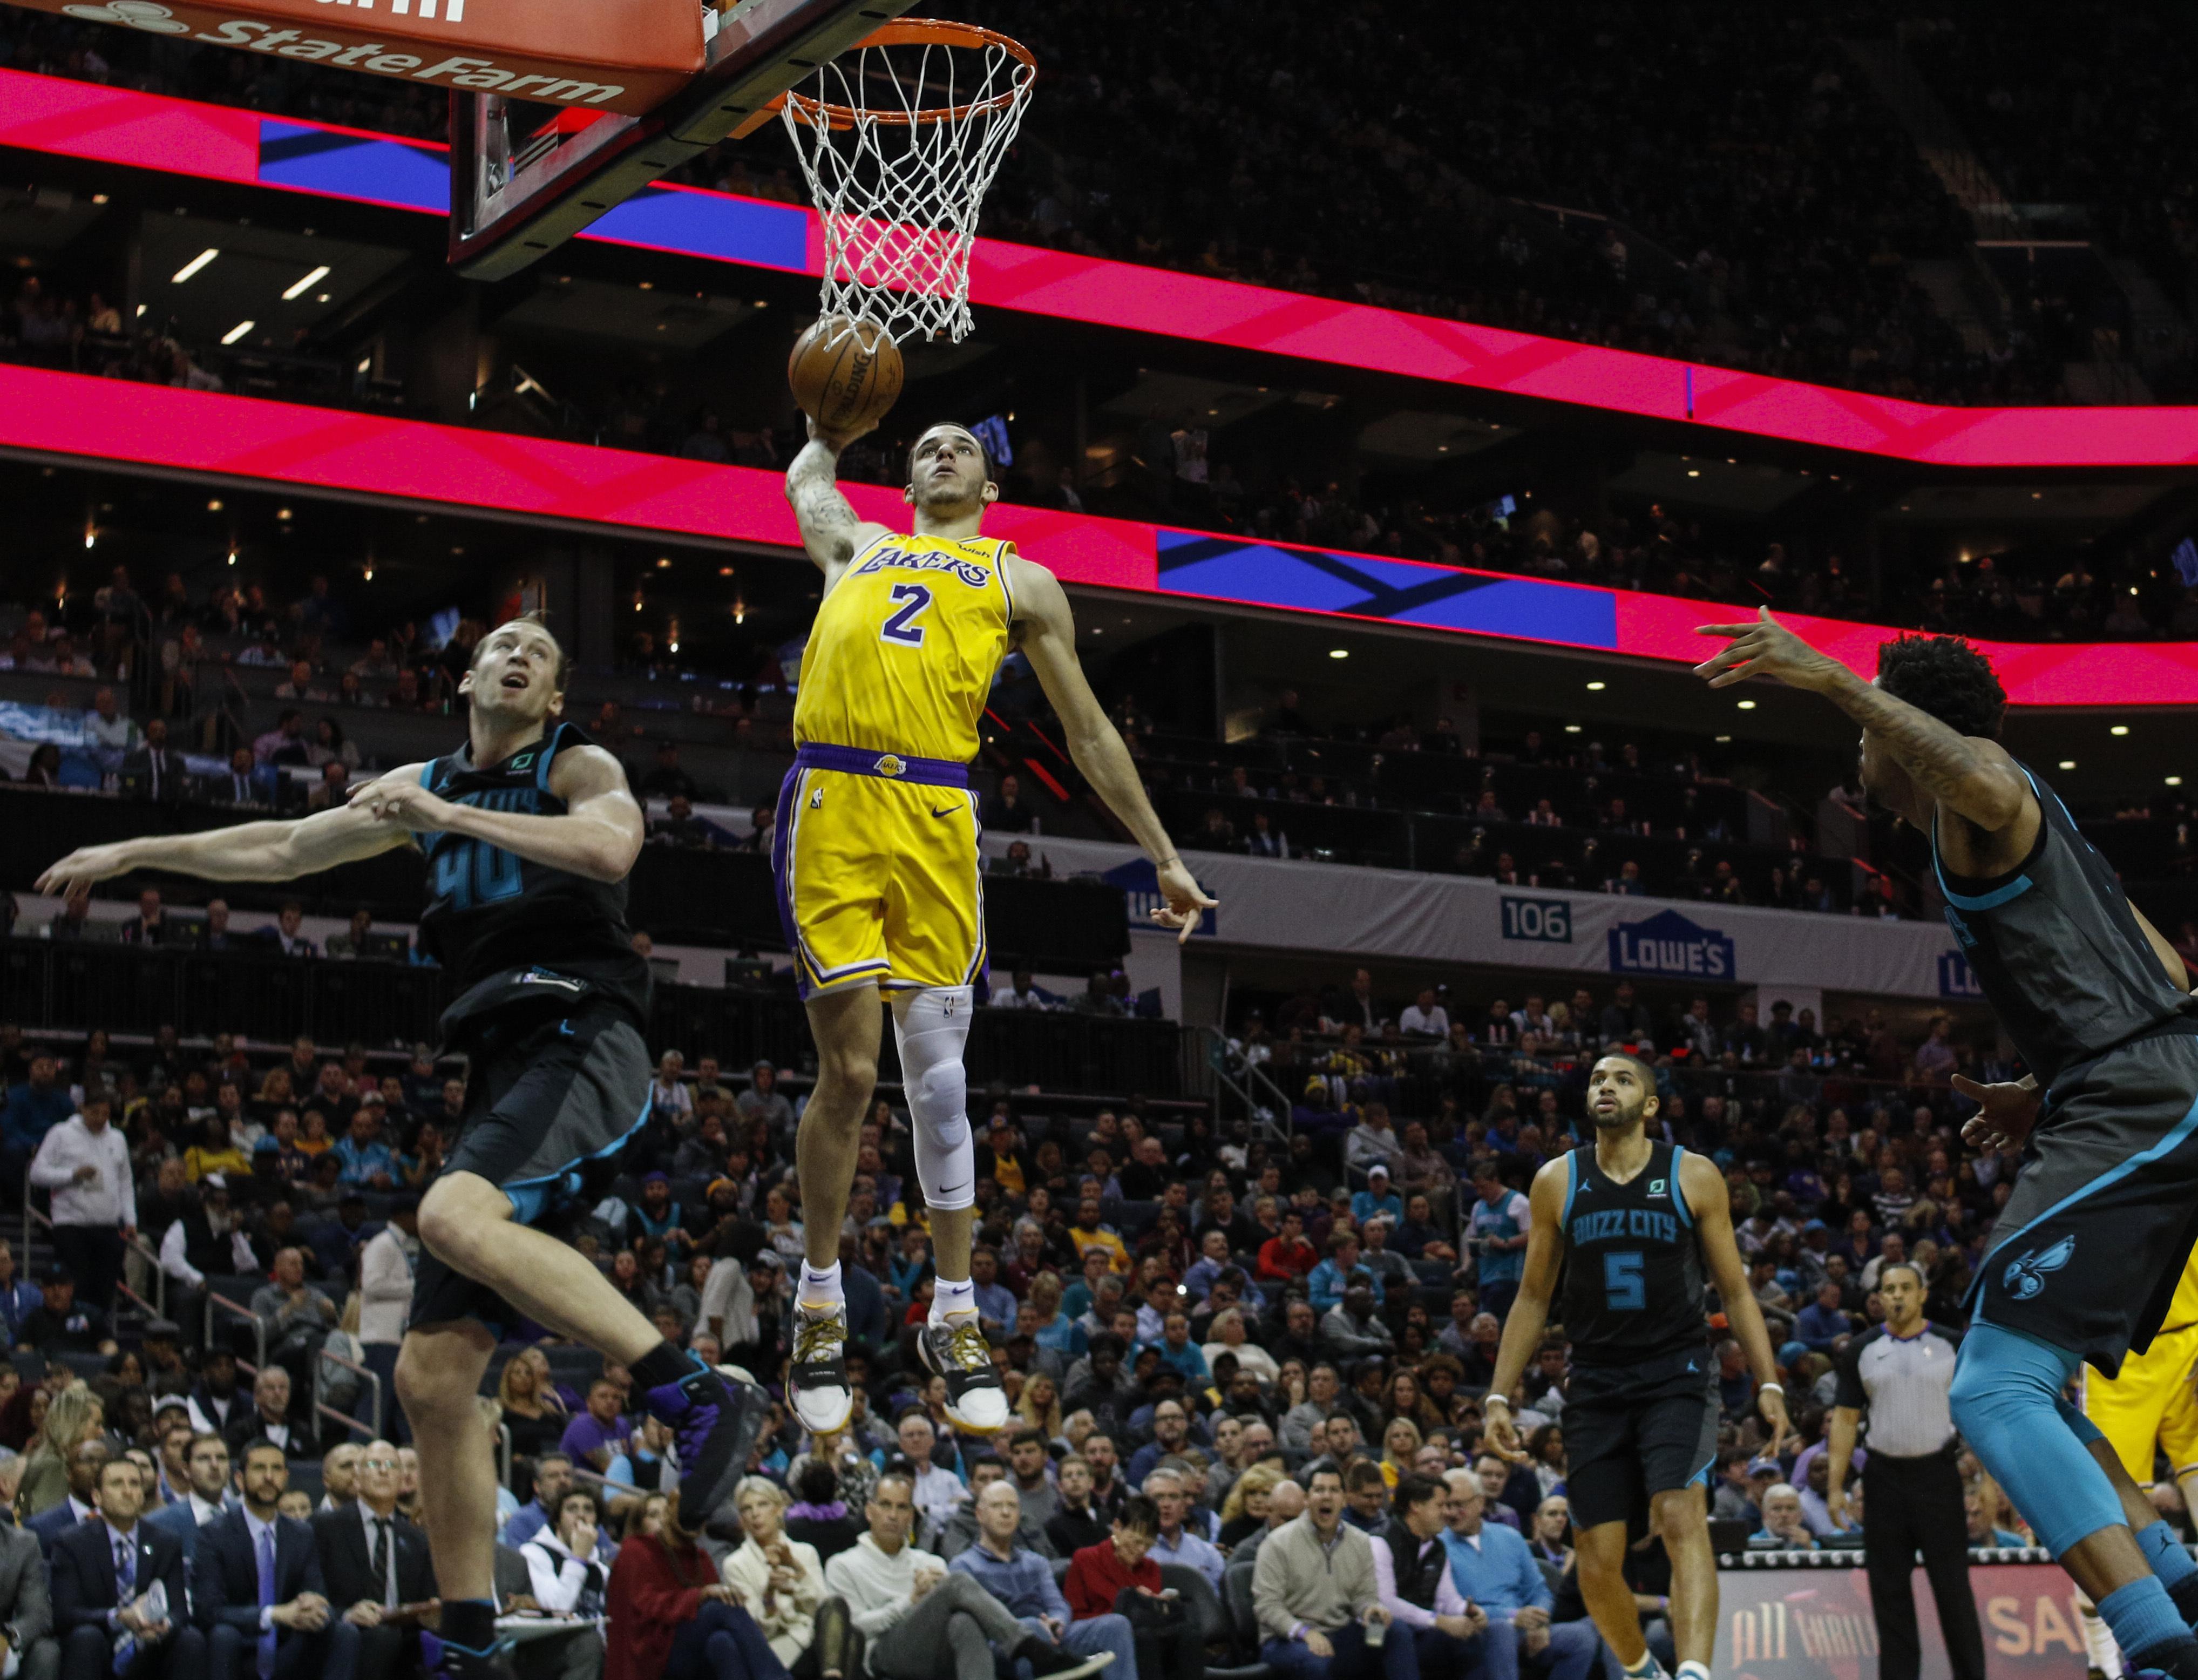 d1872f0d1d2 Los Angeles Lakers guard Lonzo Ball (2) dunks against Charlotte Hornets  center Cody Zeller